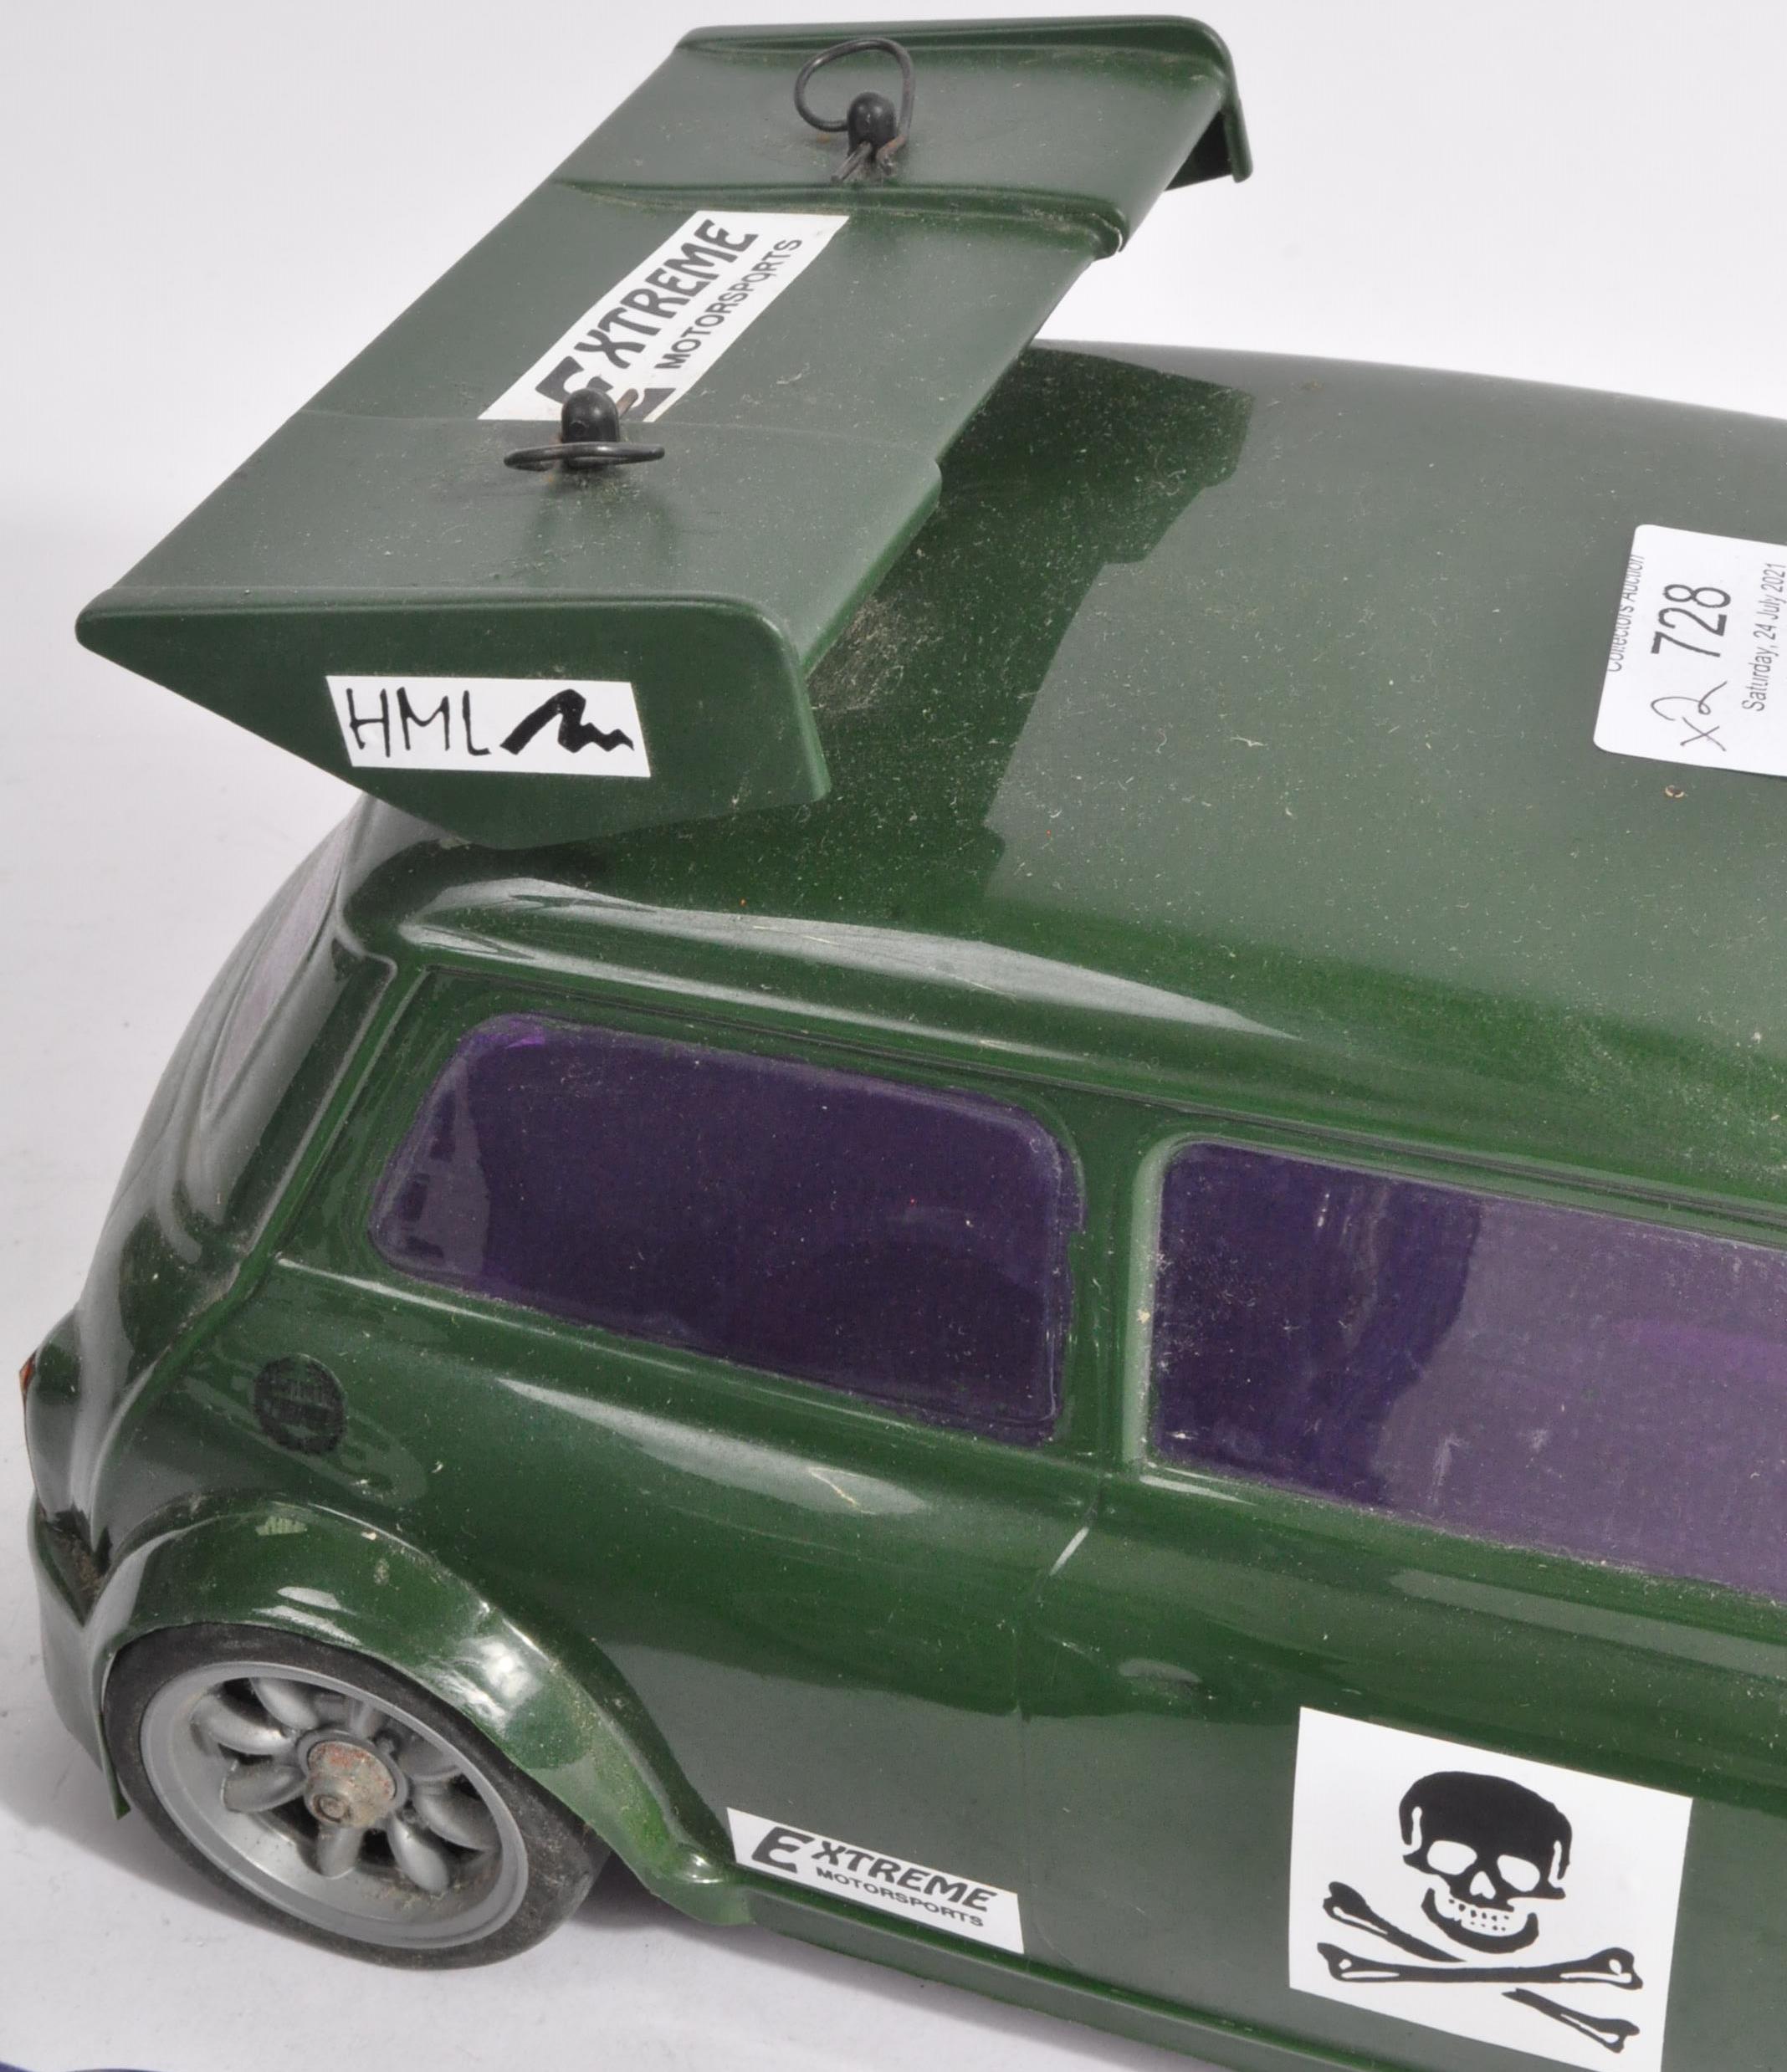 TAMIYA - TWO VINTAGE MINI COOPER RACING RC RADIO CONTROLLED CARS - Image 5 of 5